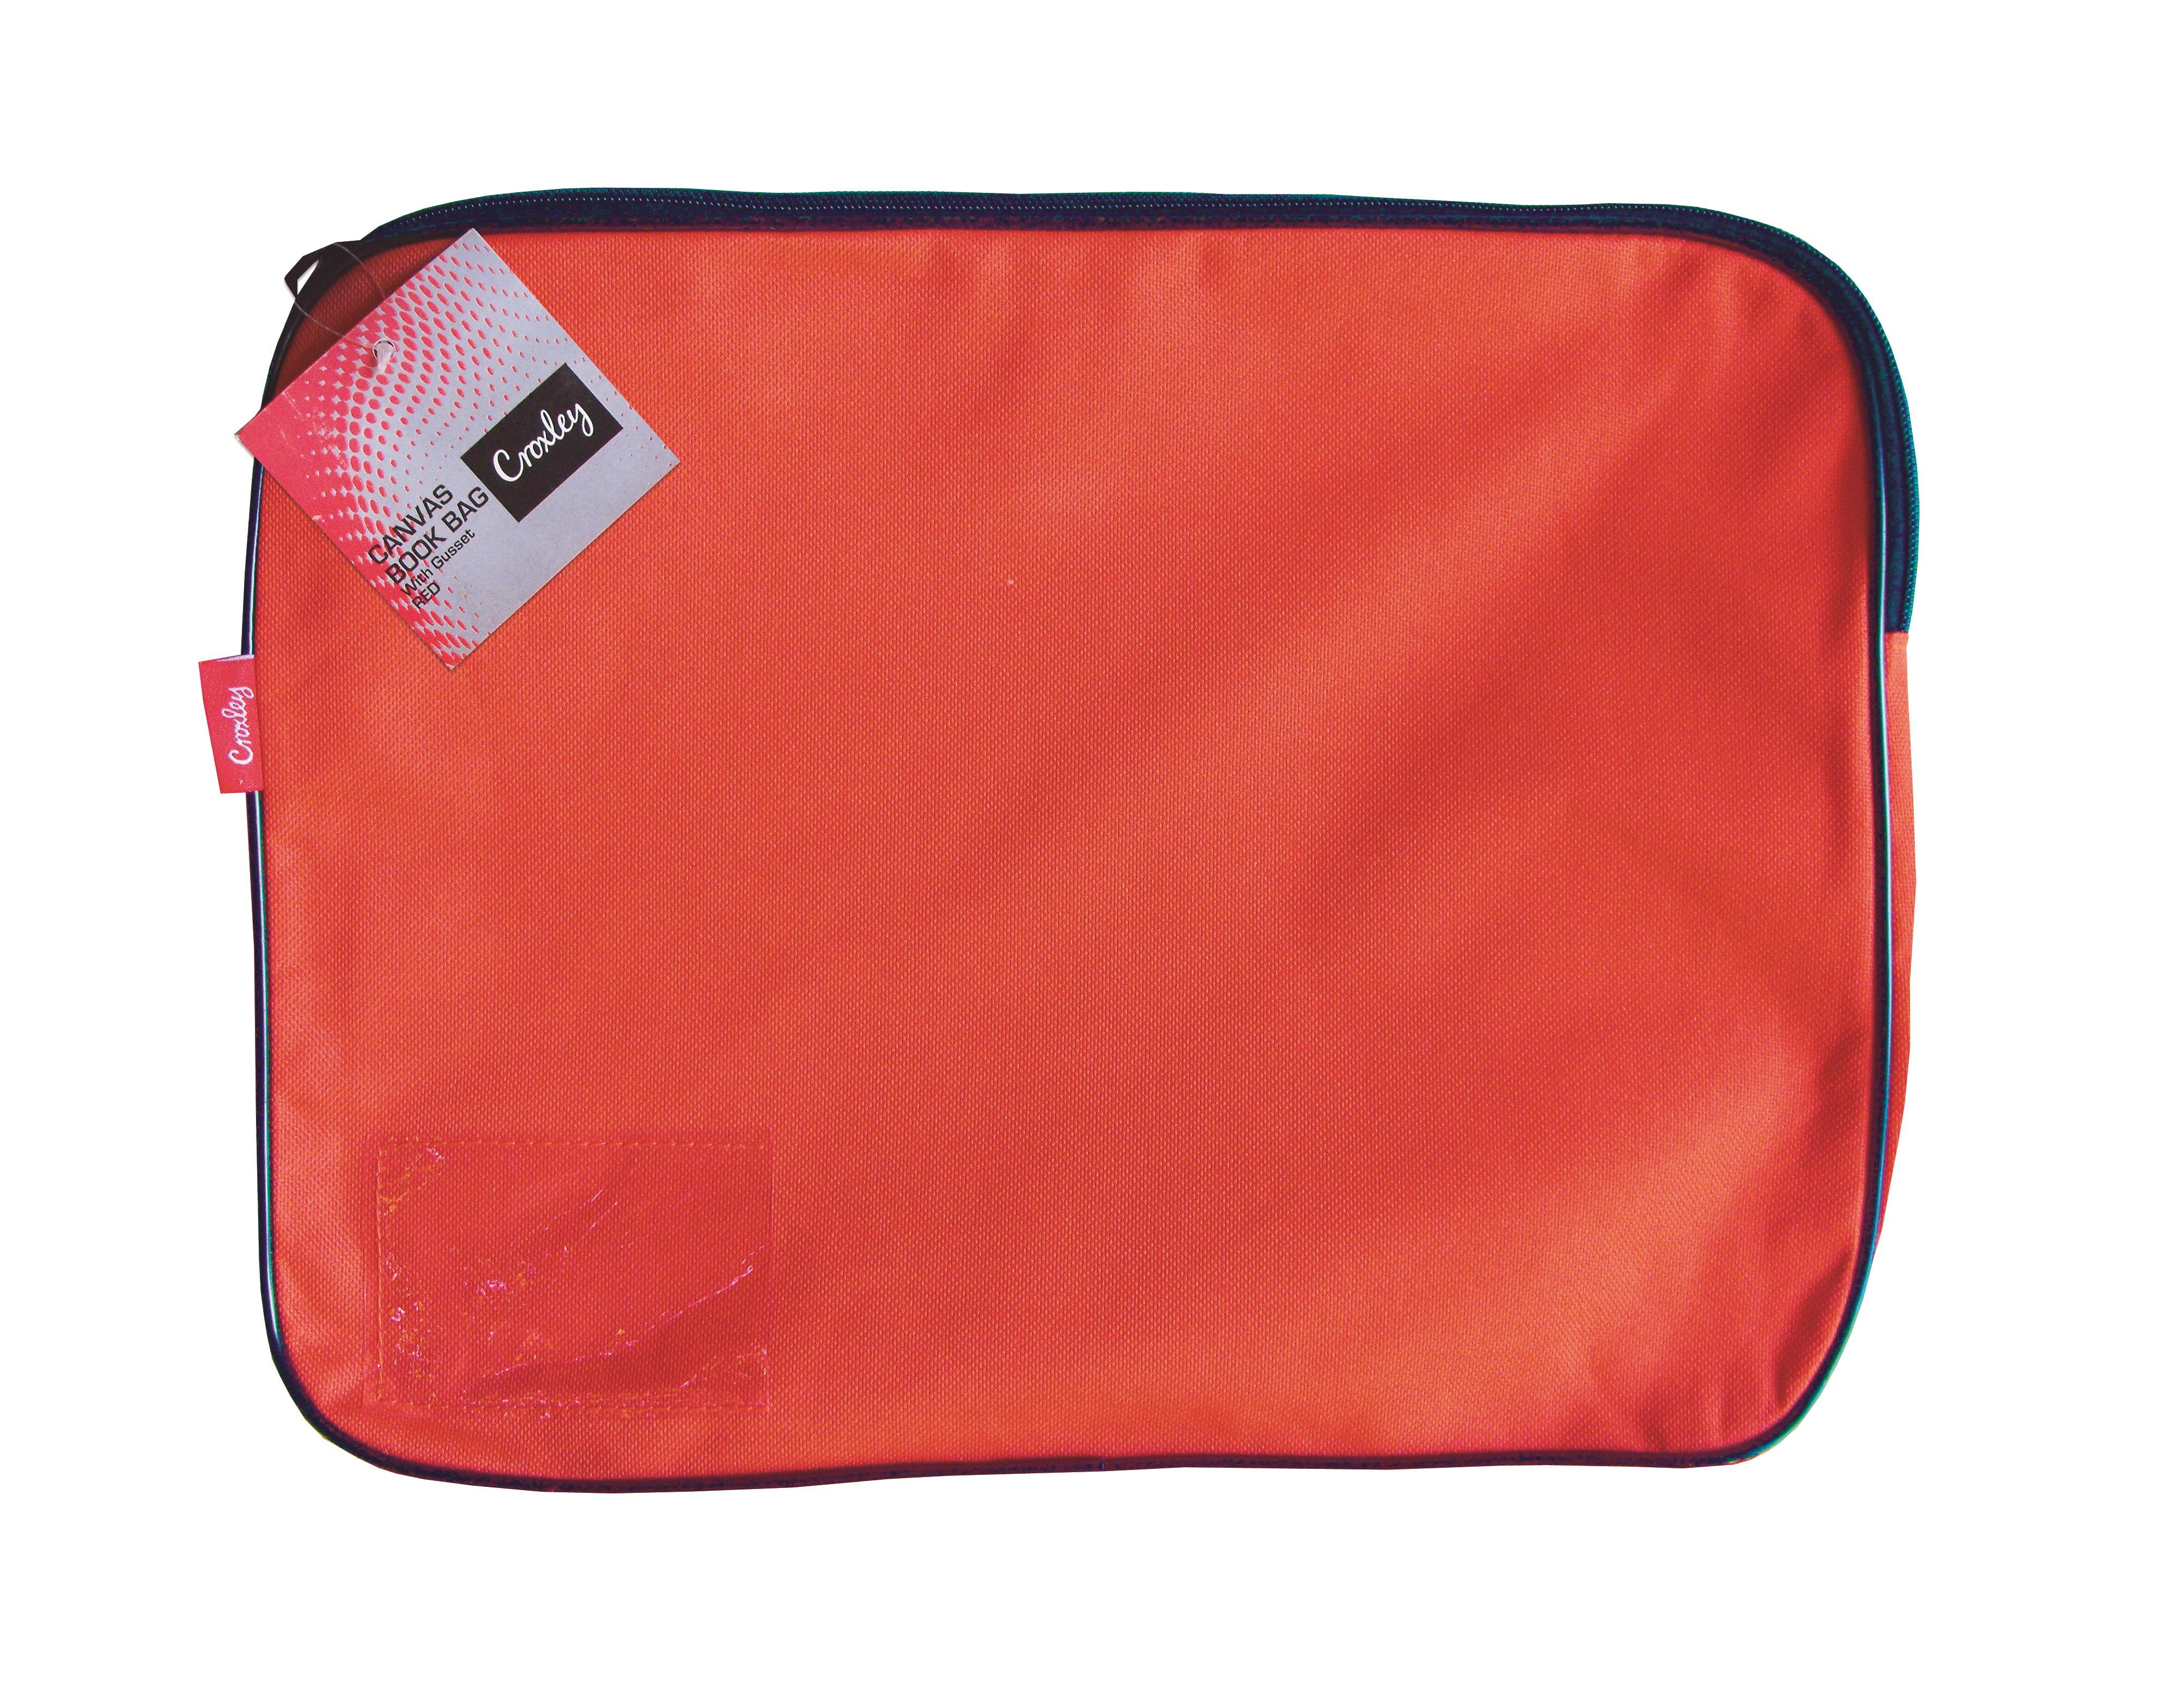 Croxley Canvas Gusset Book Bag Orange